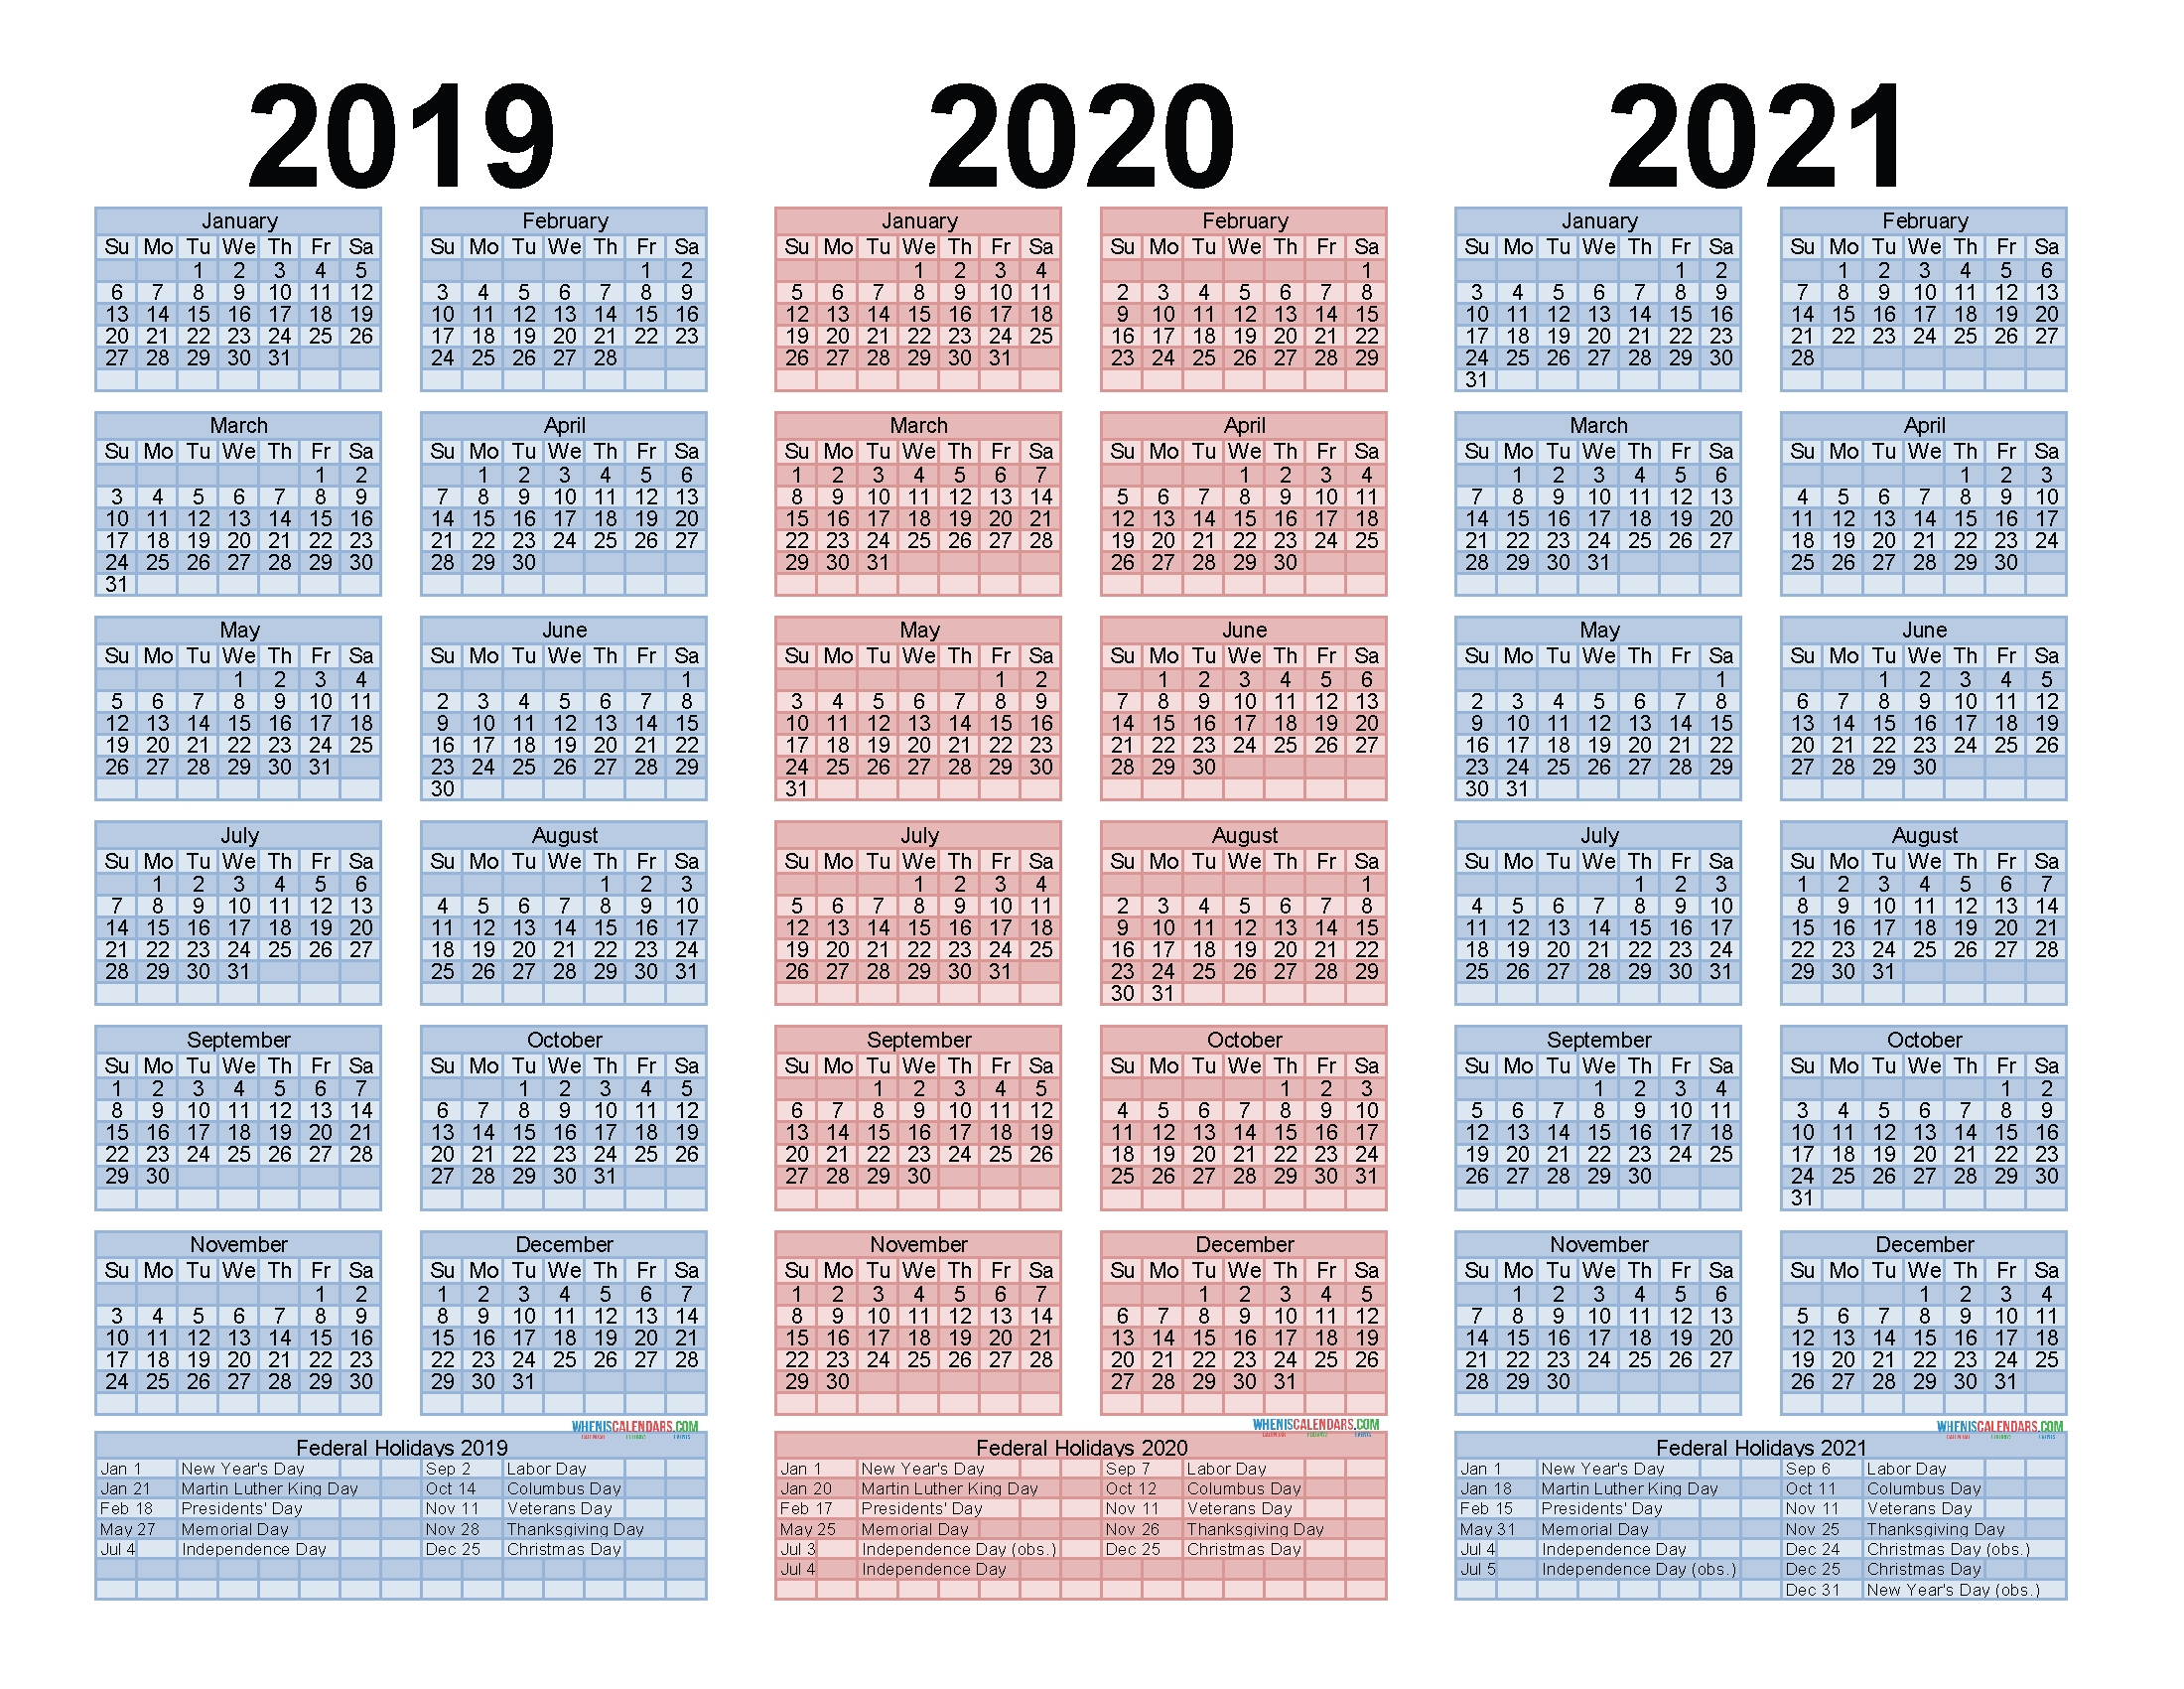 2019 To 2021 Free Calendar Template 3 Year Calendar Printable - Free Printable 2020 Monthly throughout Three Year Calendar 2019 2021 2021 Calendar Pedia